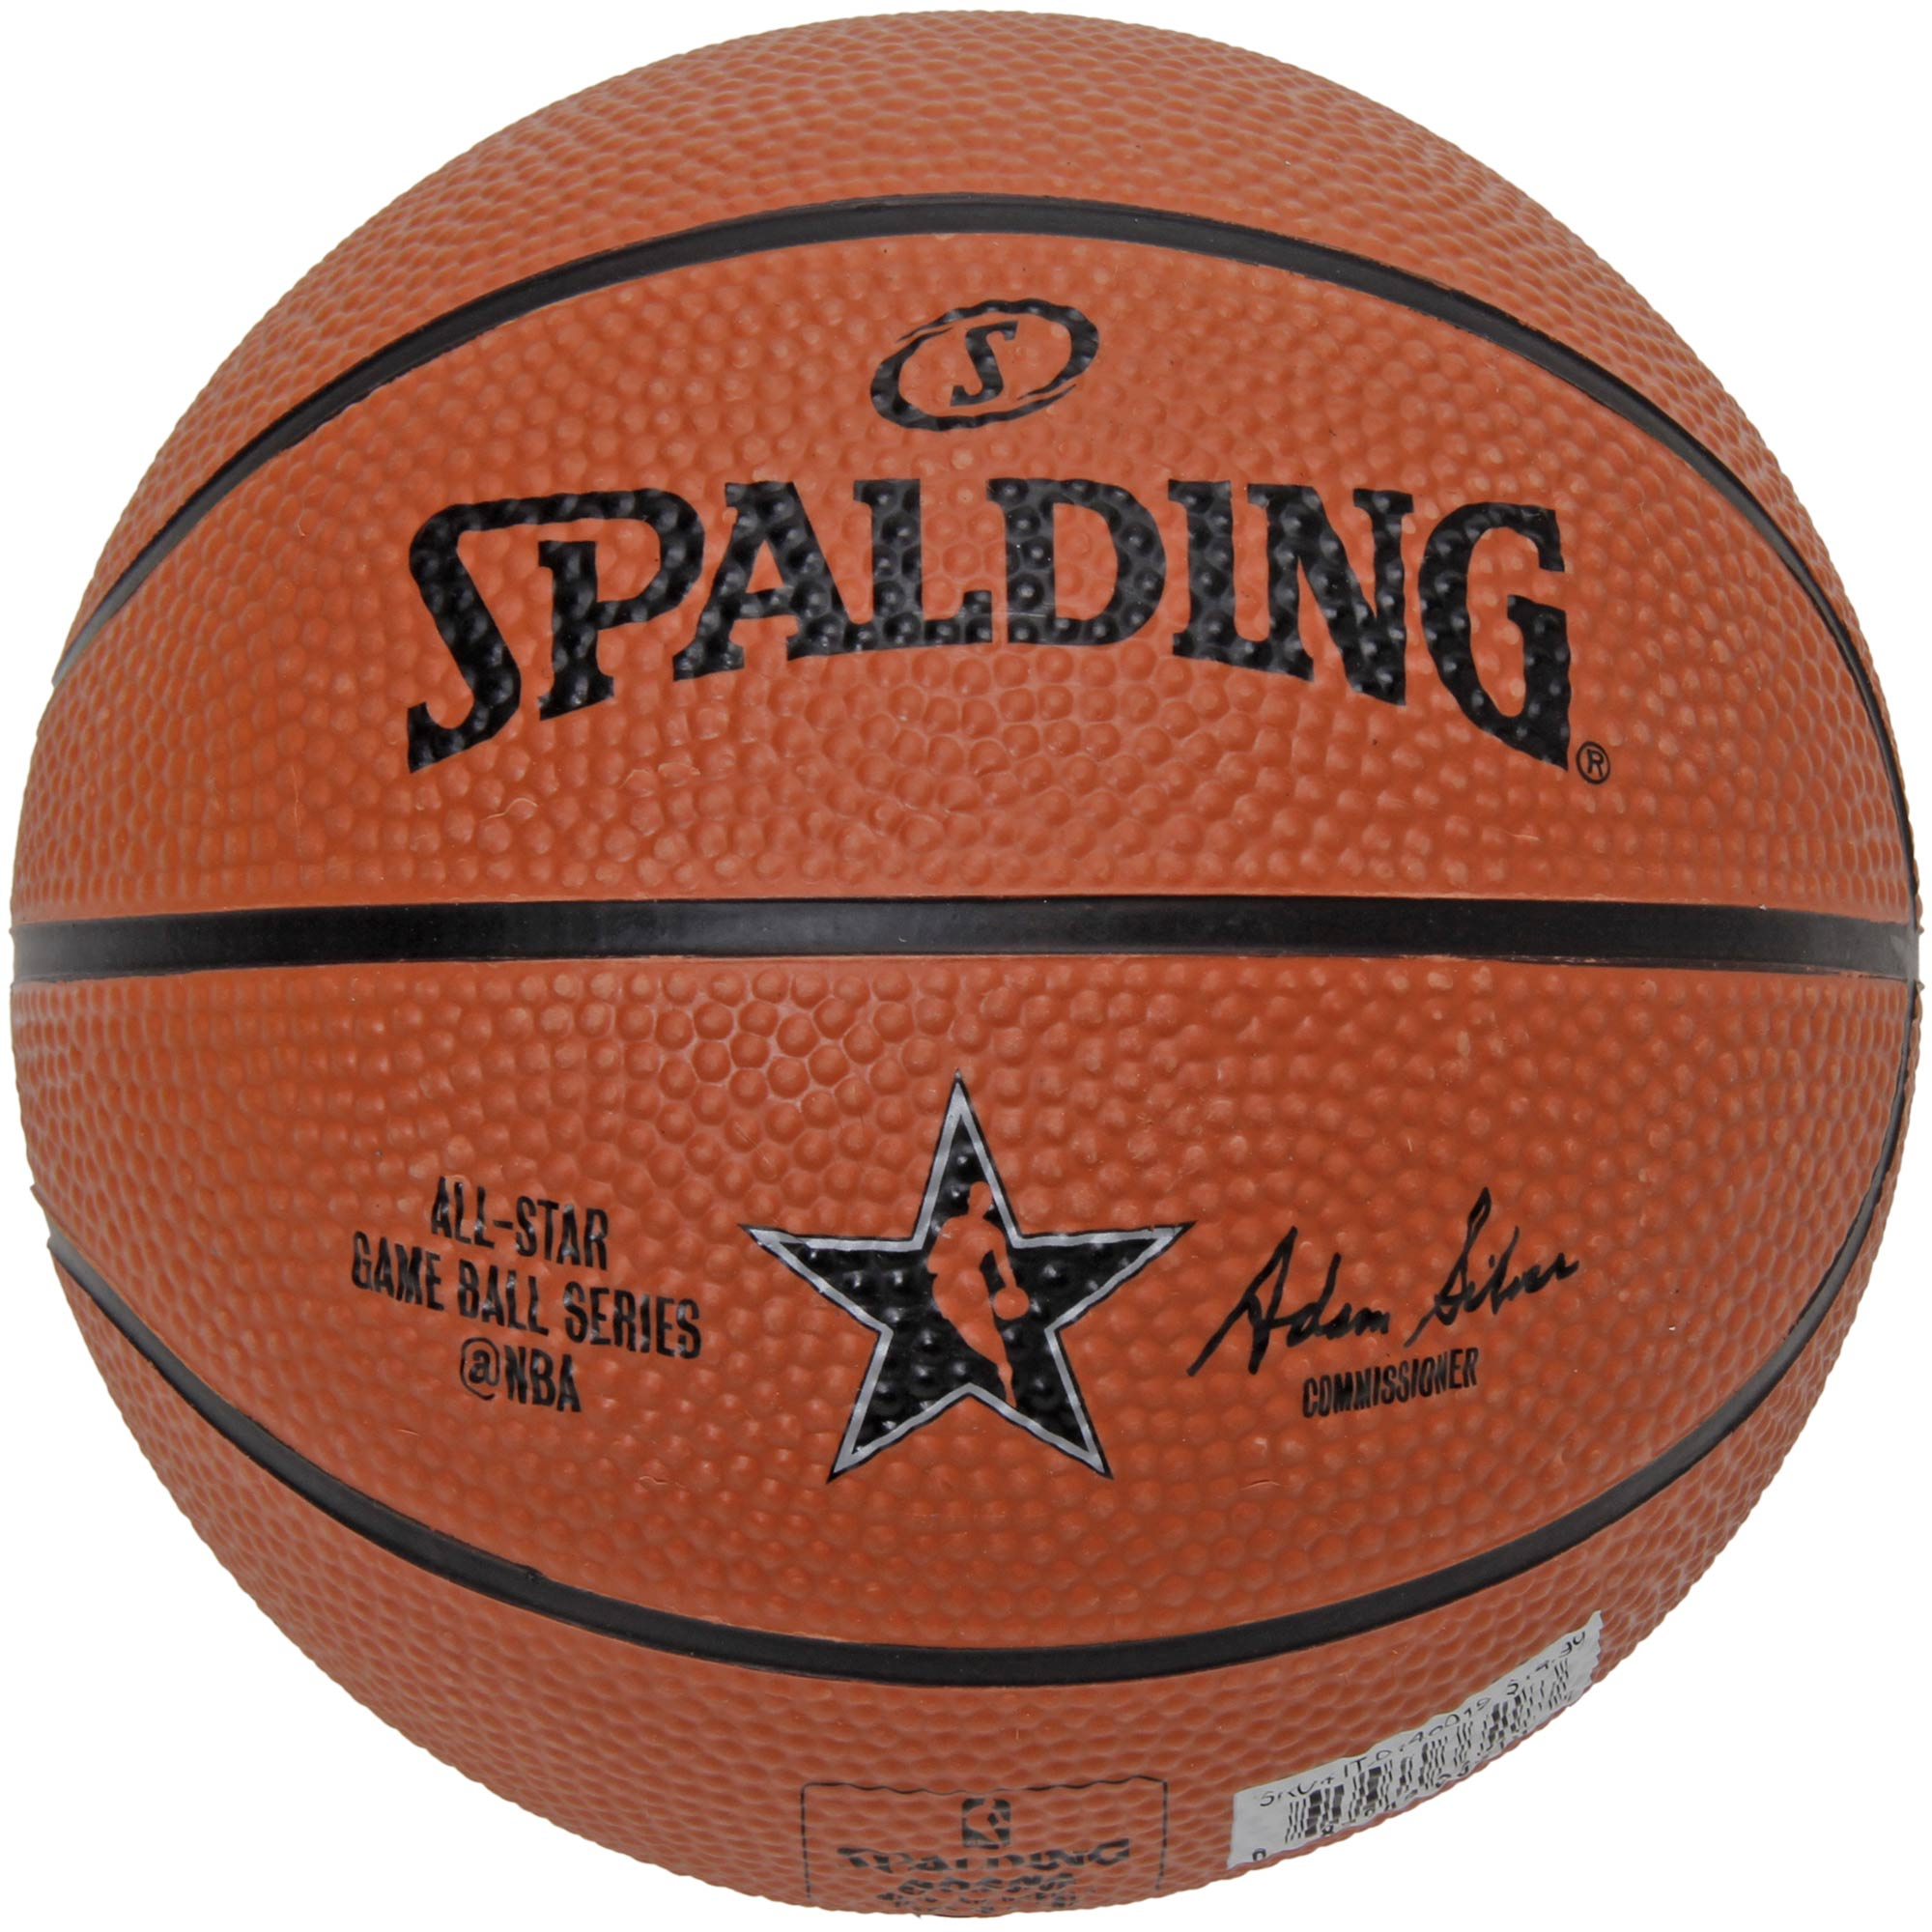 Spalding 2017 NBA All-Star Game Micro Replica Basketball - No Size